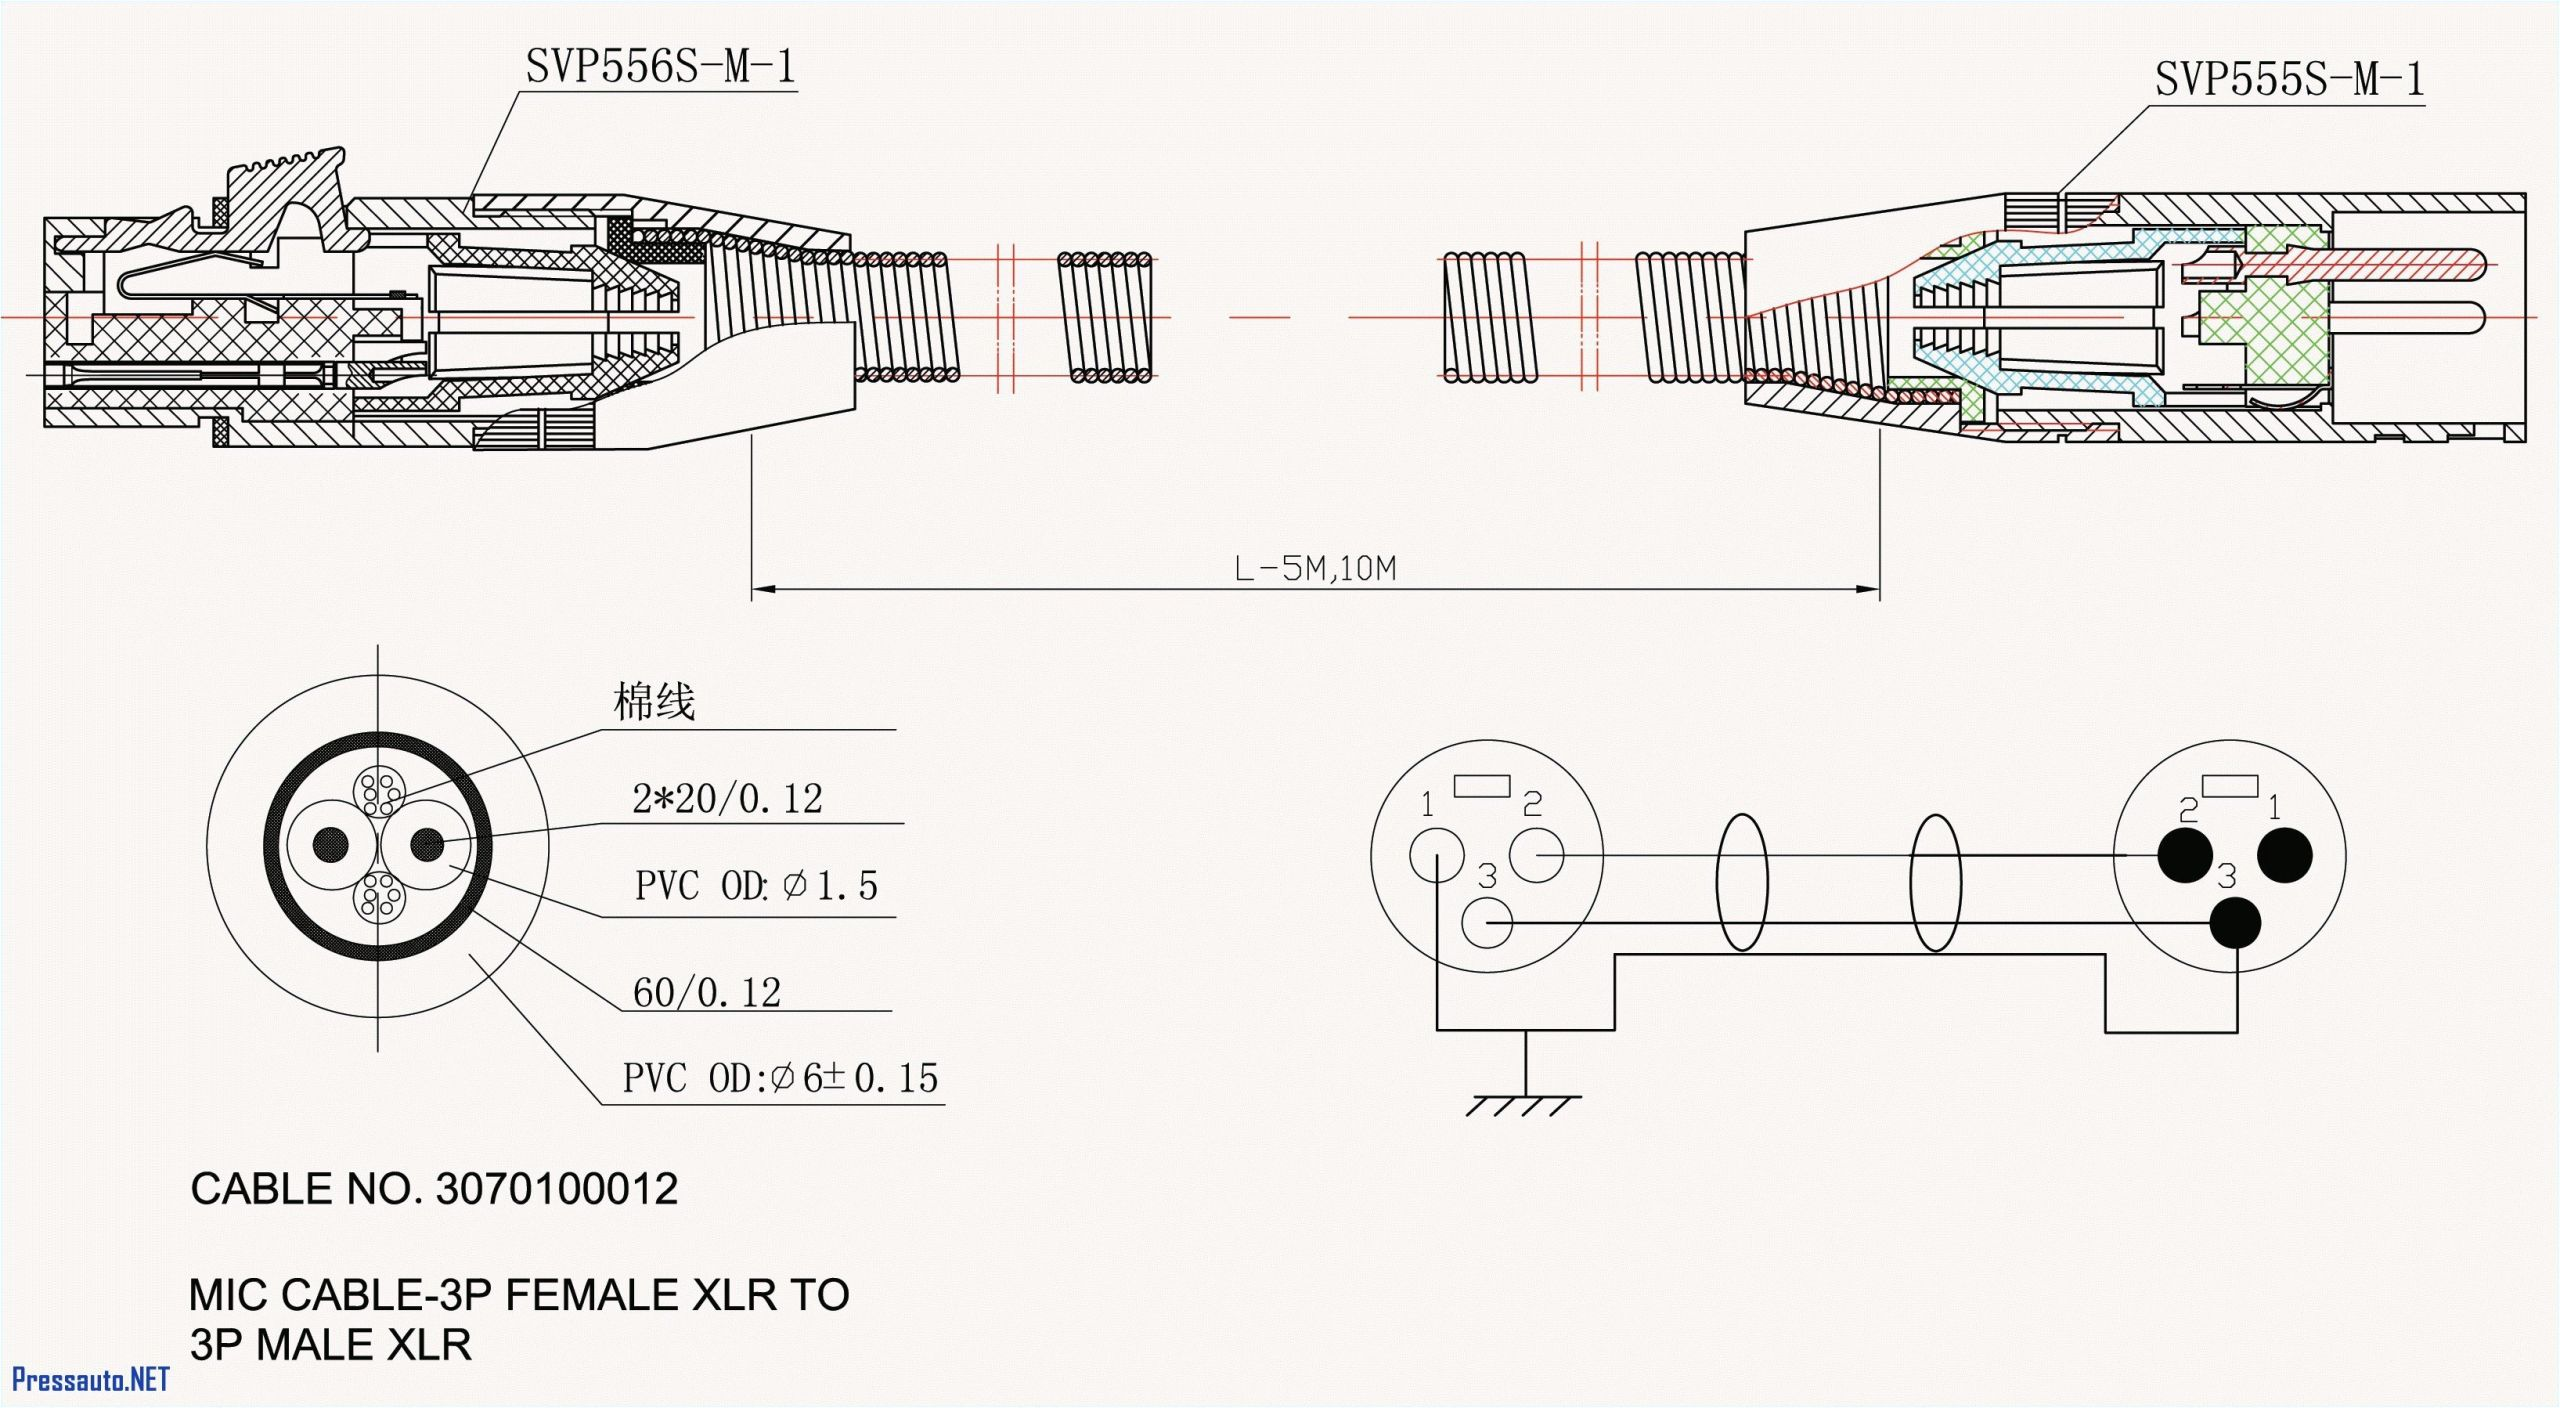 hot tub wiring diagram 60 amp wiring diagram 60 amp disconnect jpg